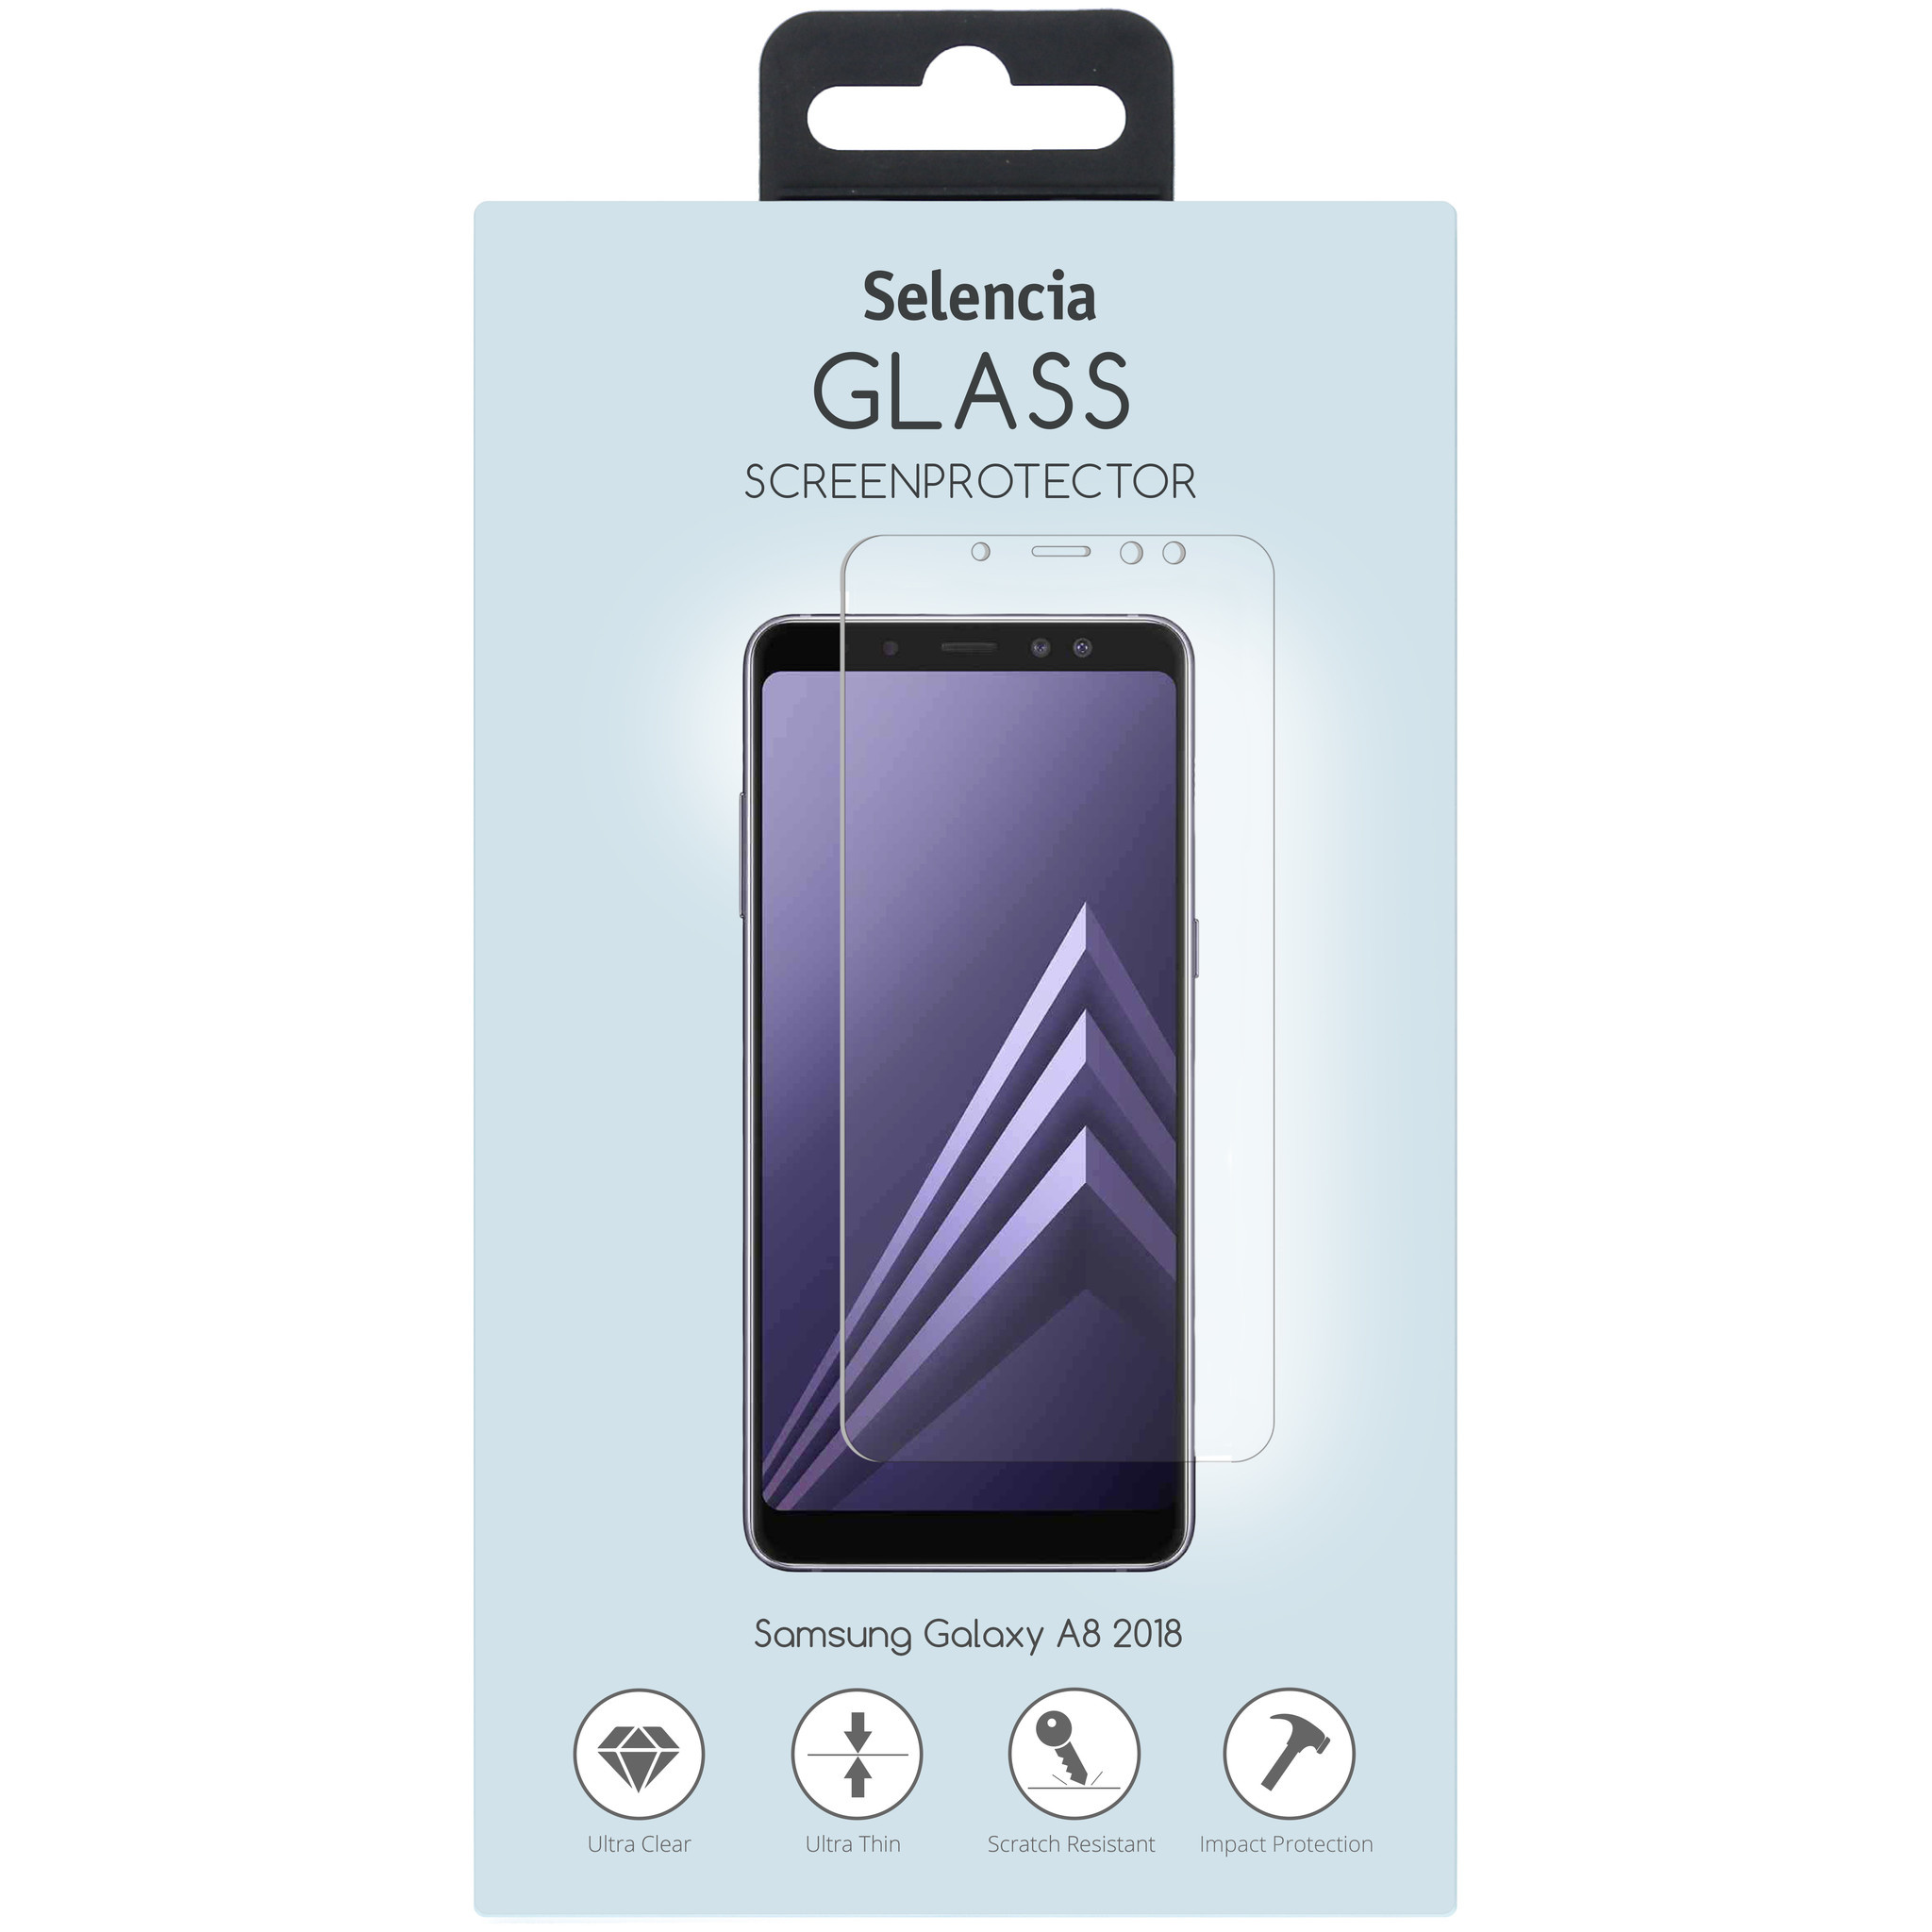 Selencia Displayschutz aus gehärtetem Glas Samsung Galaxy A8 (2018)